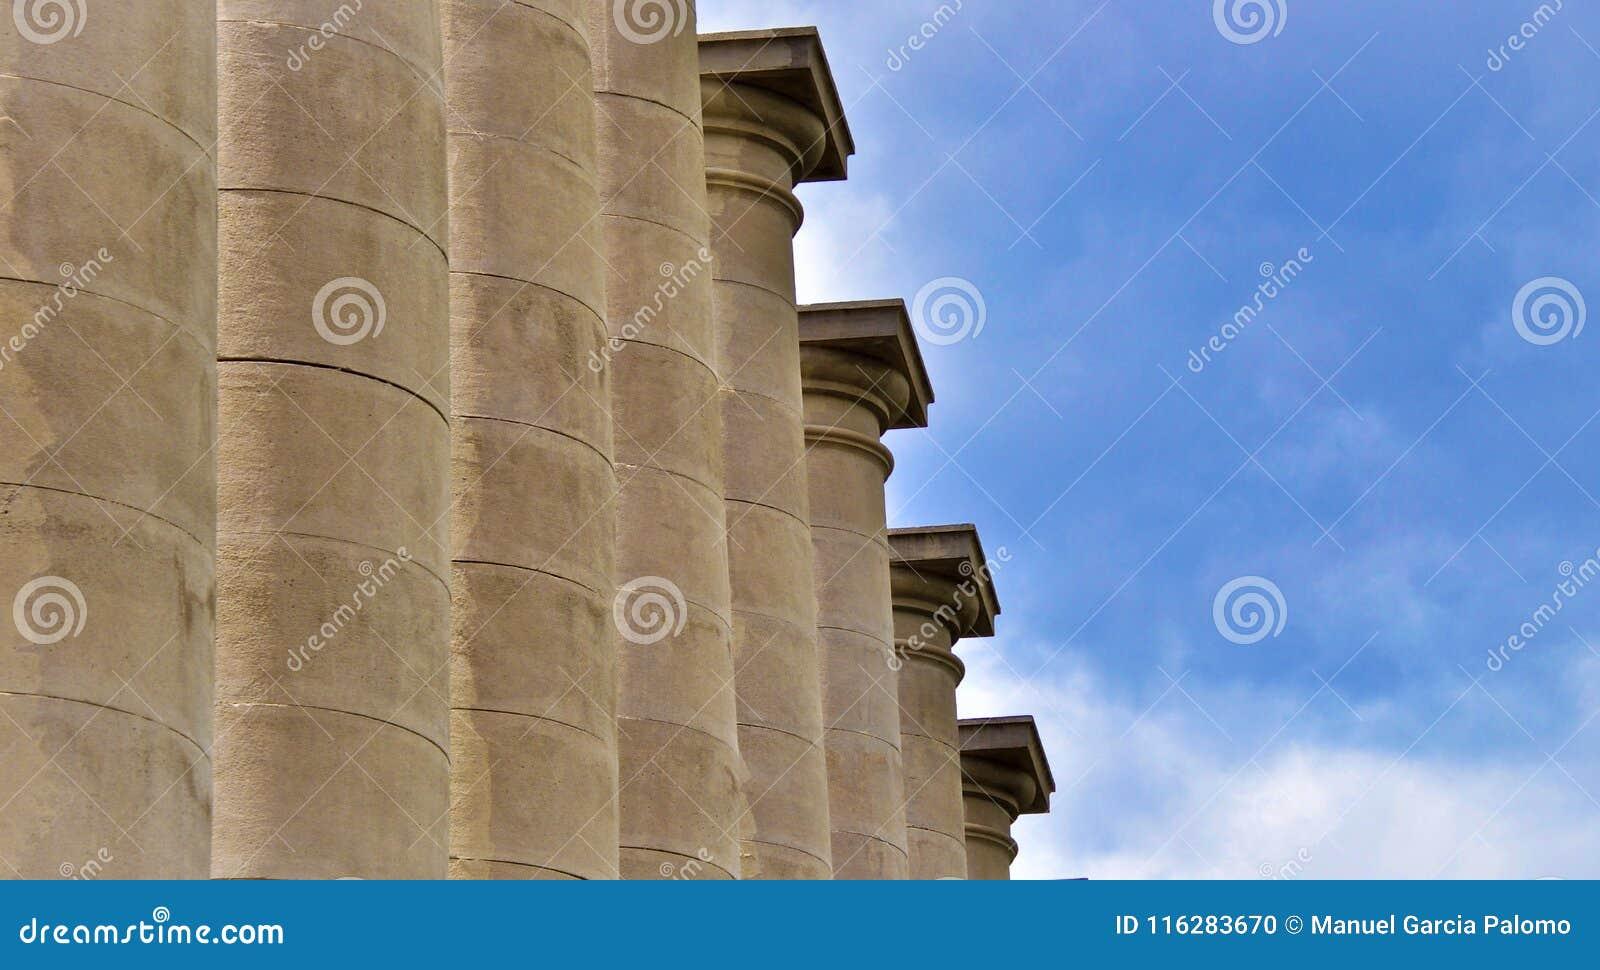 Klassieke kolommen onder blauwe hemel in Barcelona Spanje